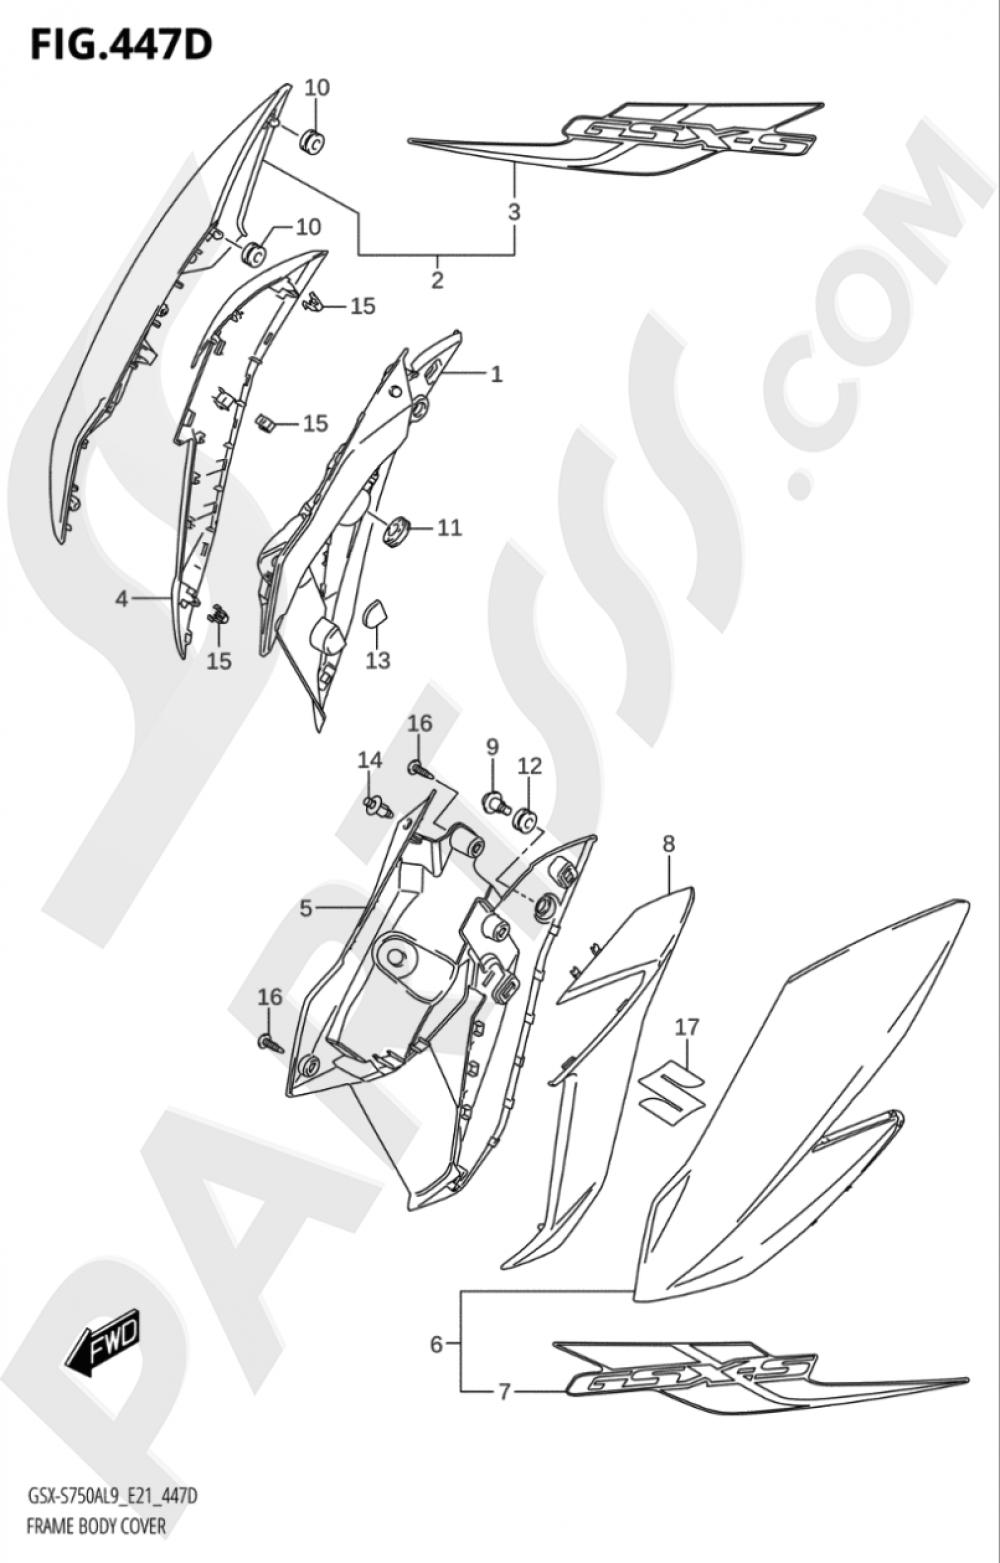 447D - FRAME BODY COVER (GSX- S750UQYL9 E21) Suzuki GSX-S750YA 2019